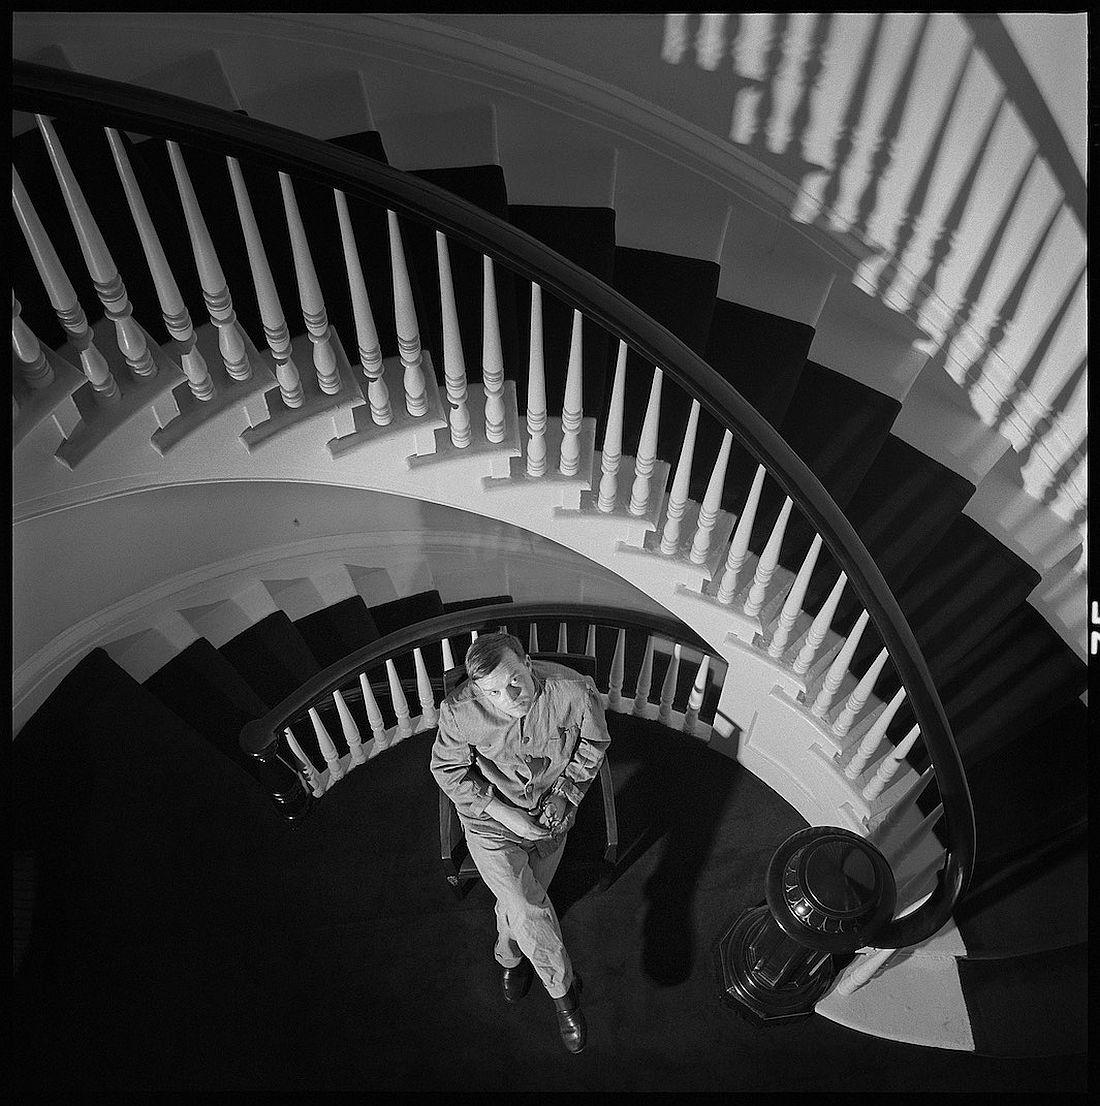 Truman Capote's Brooklyn: The Lost Photographs of David Attie. Original print by David Attie